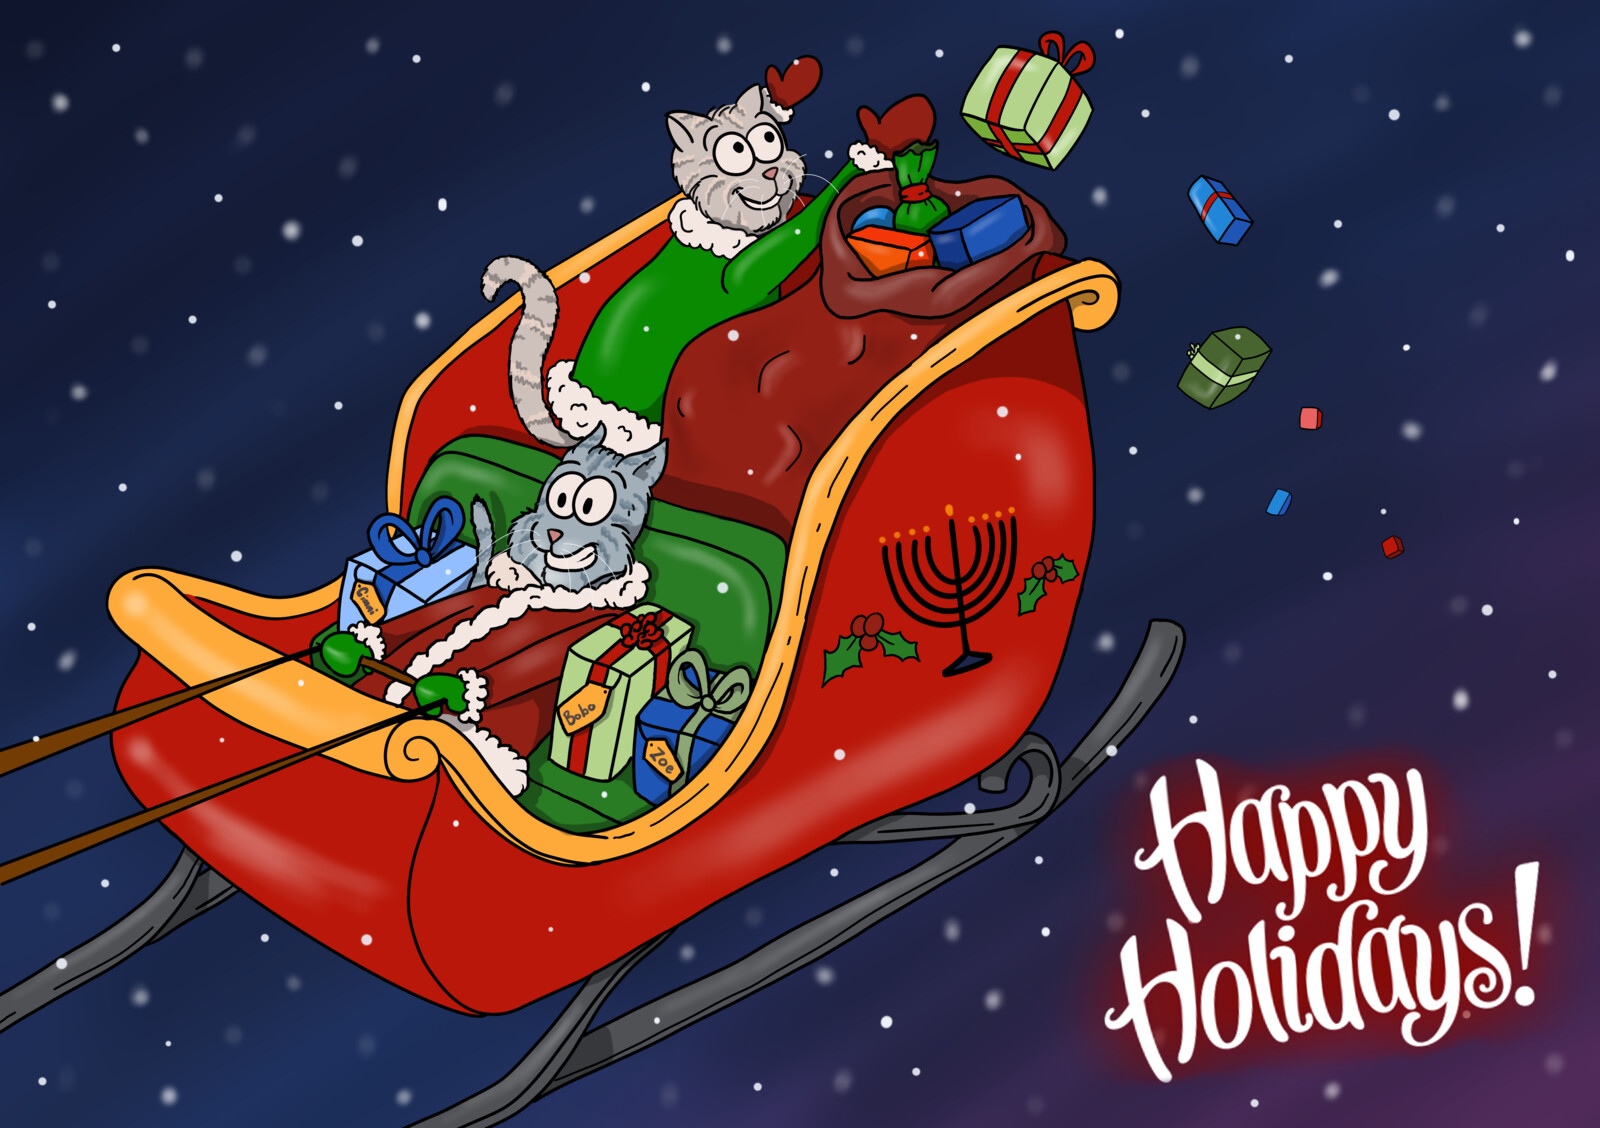 Happy Holidays #005 greeting card